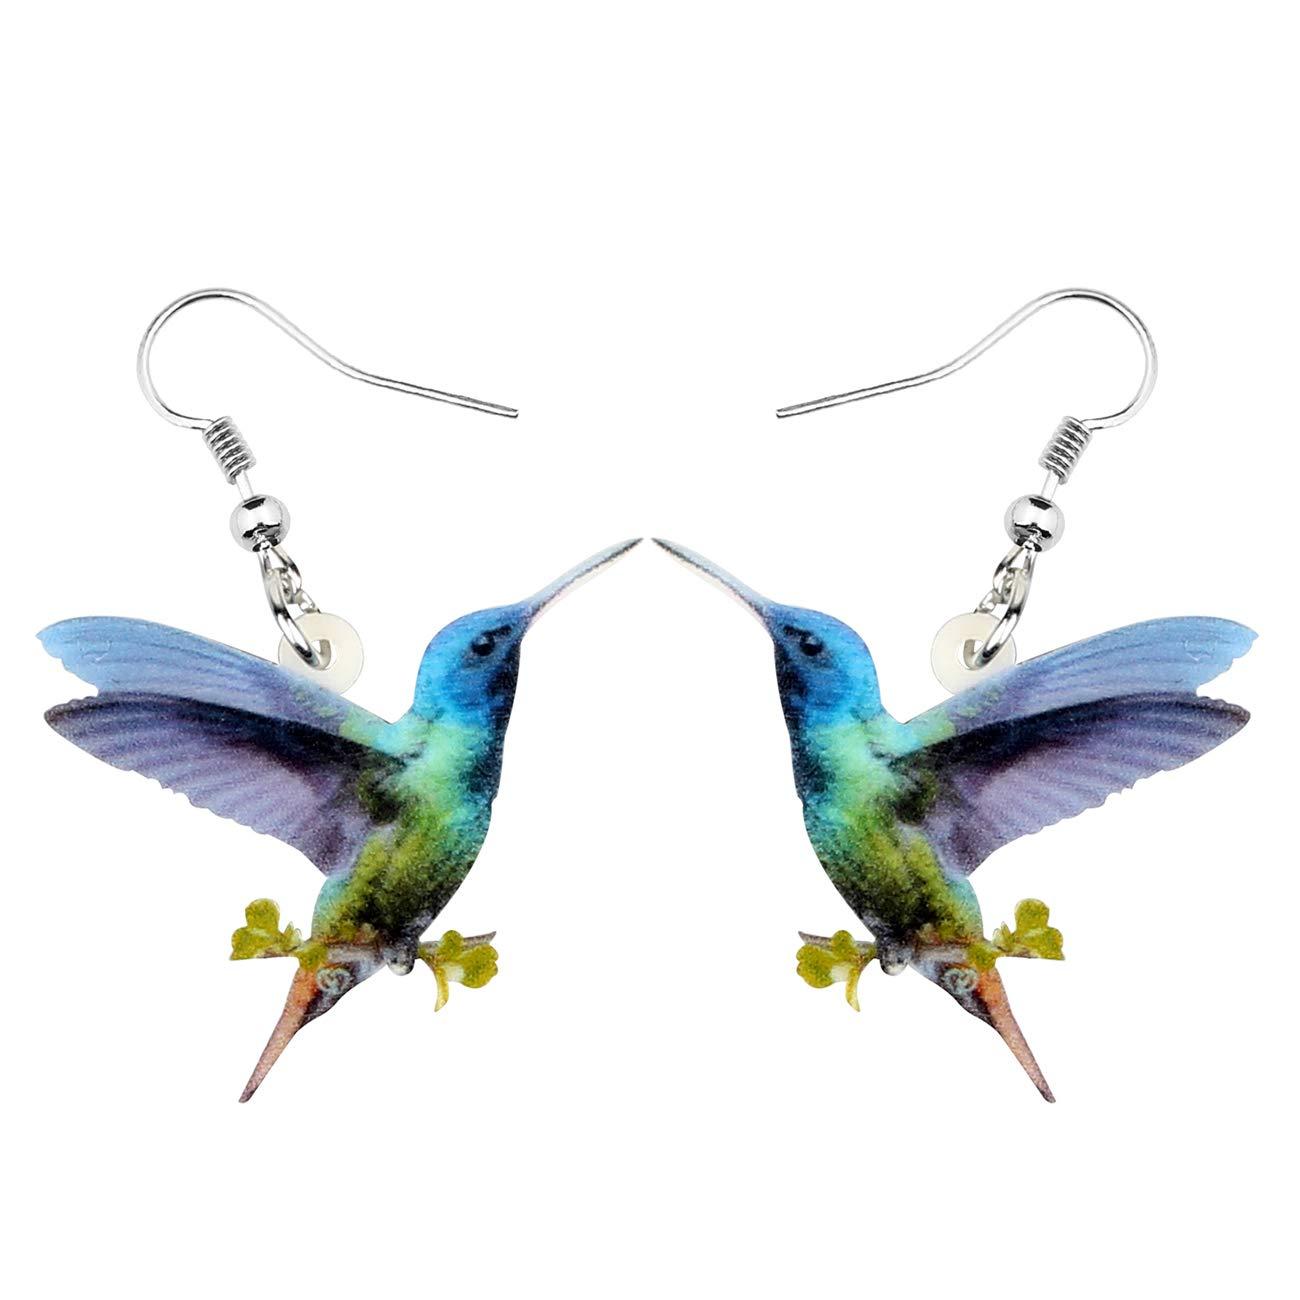 Bonsny Acrylic Drop Dangle Hummingbird Bird Earrings Jewelry For Women Girls Kids Gift Charms